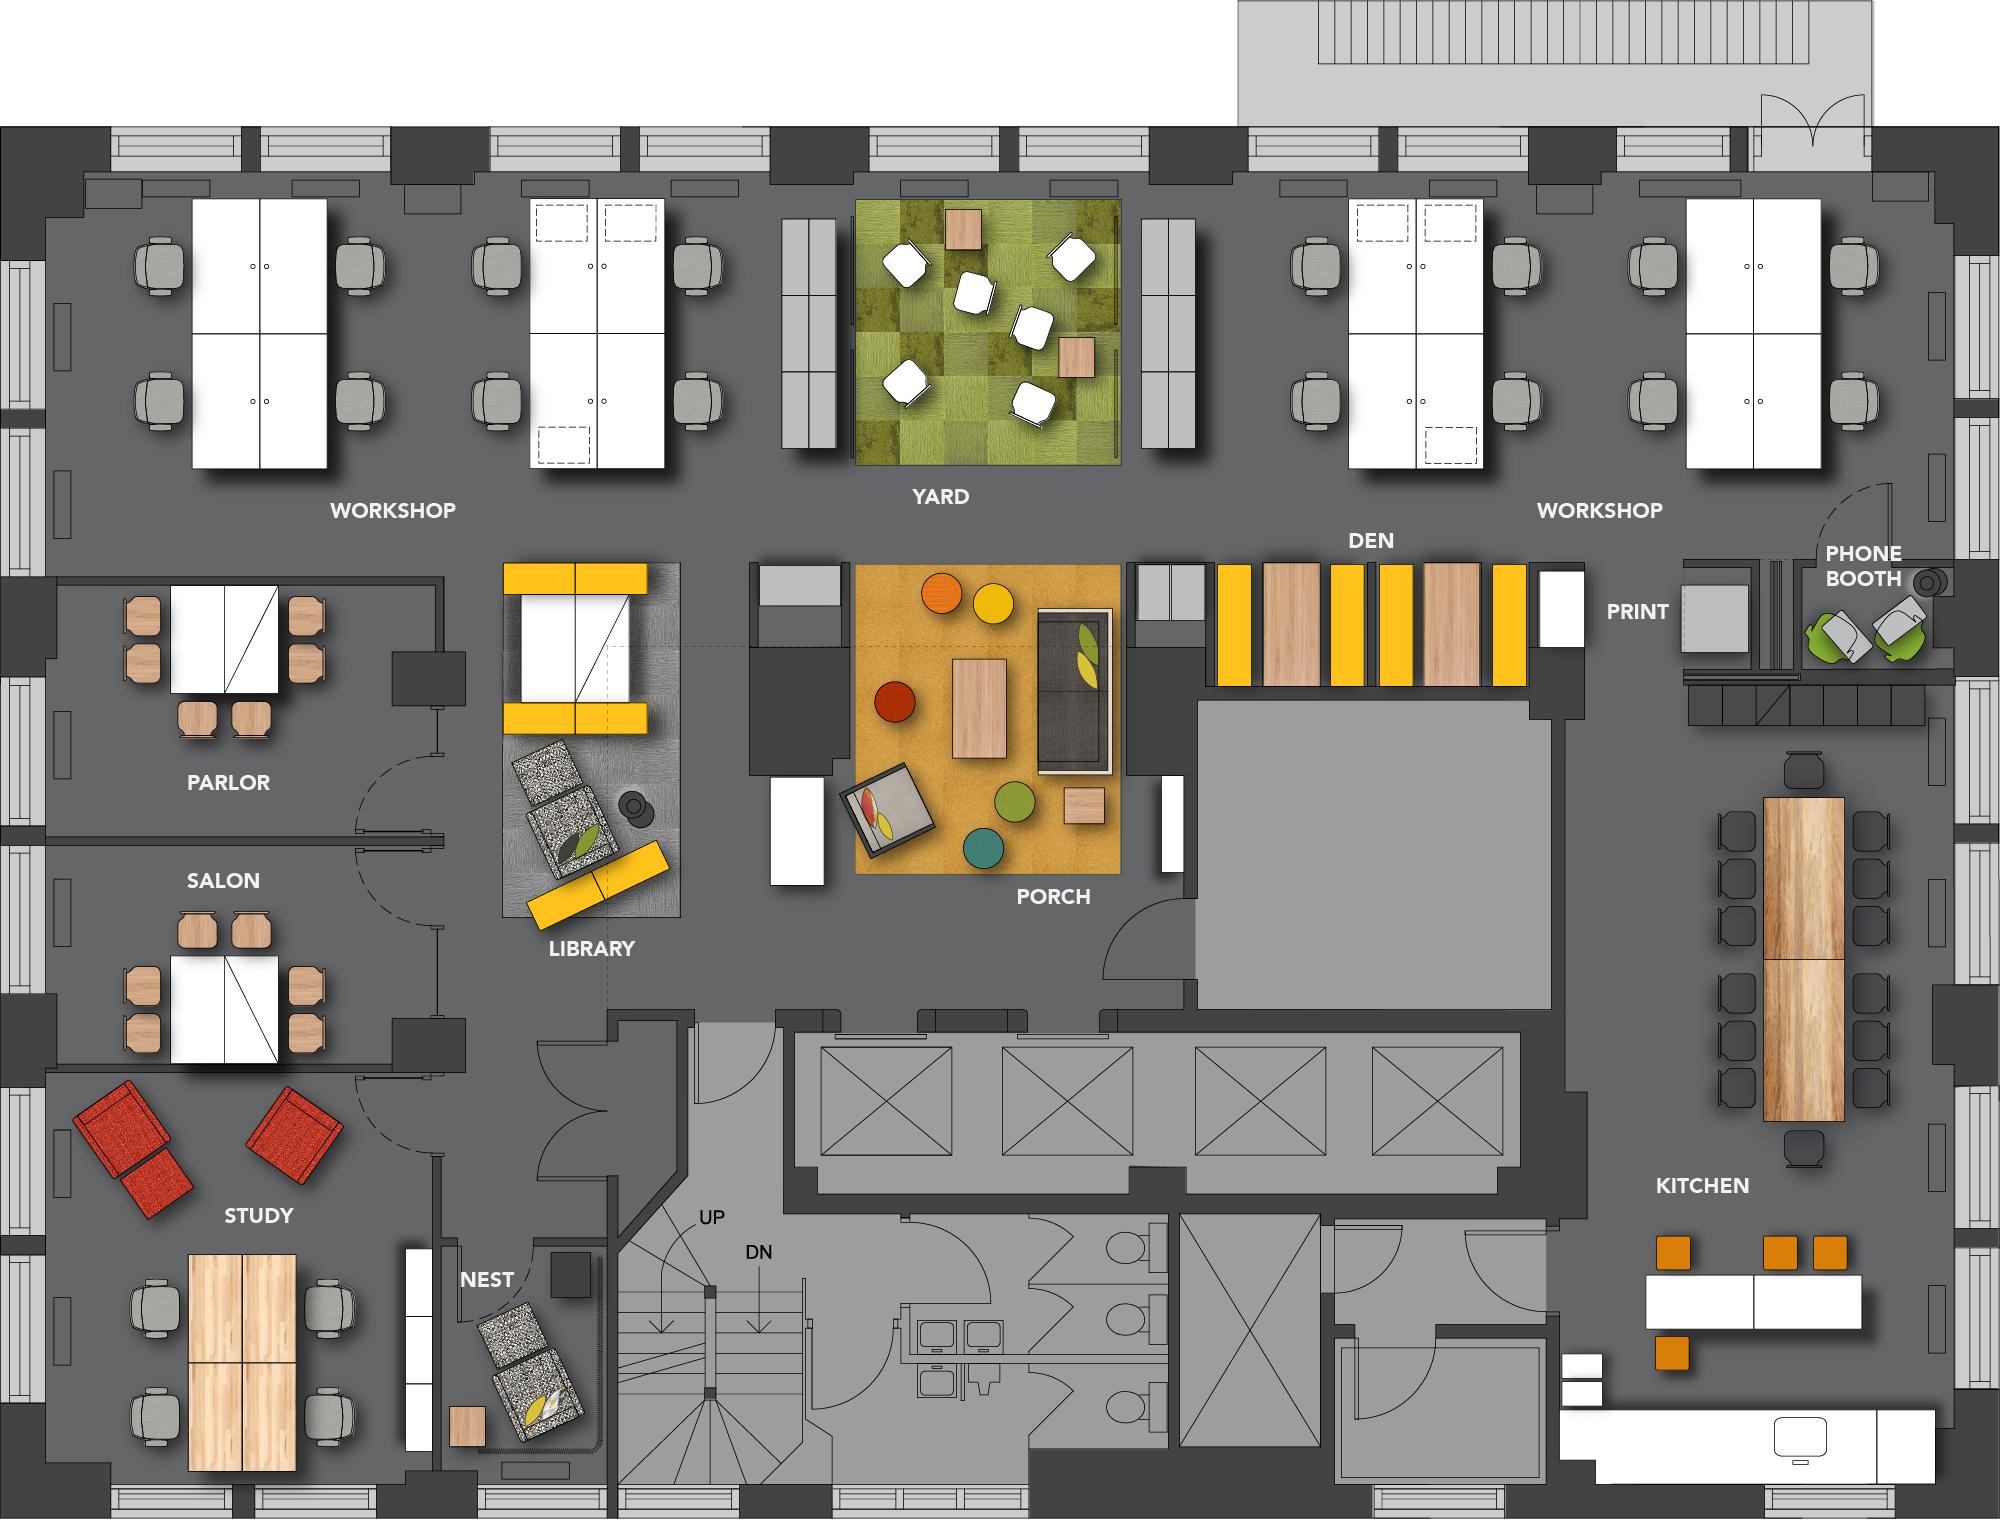 brightspot new office plan - small